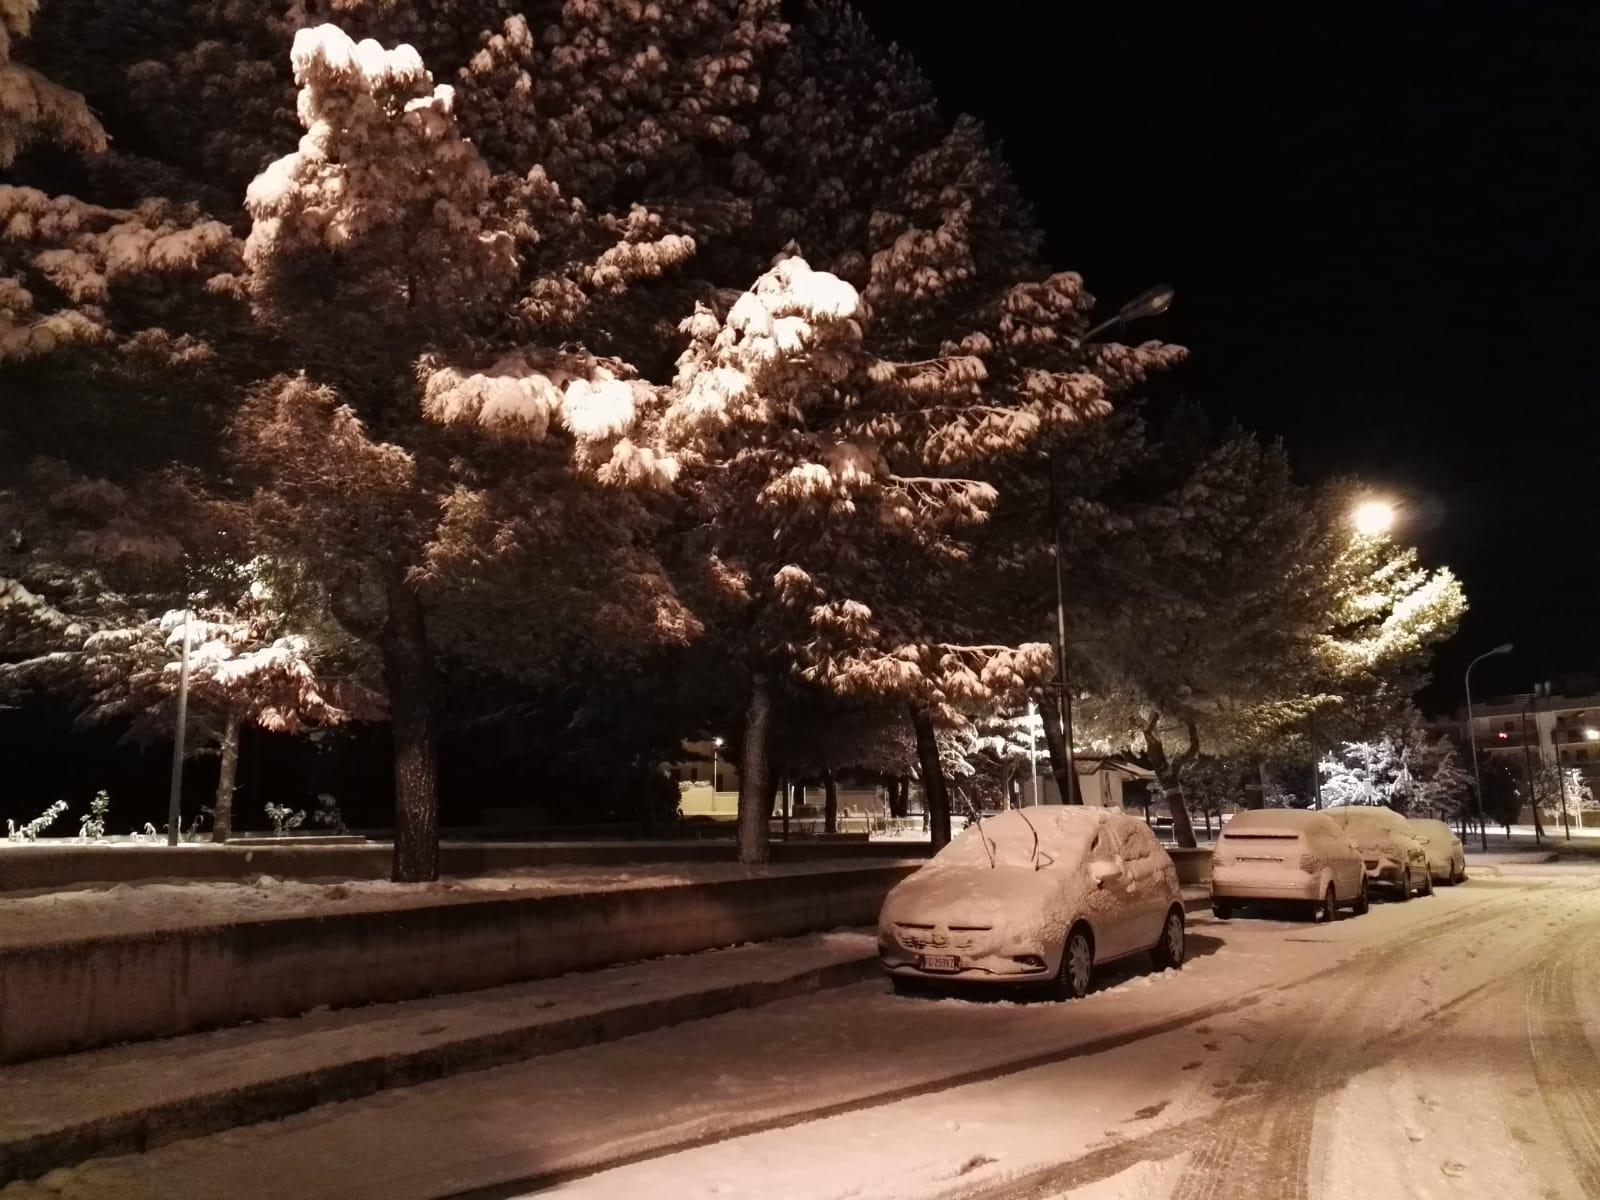 Galleria fotografica neve 03-04 gennaio 2019-neve2019-n3.jpg